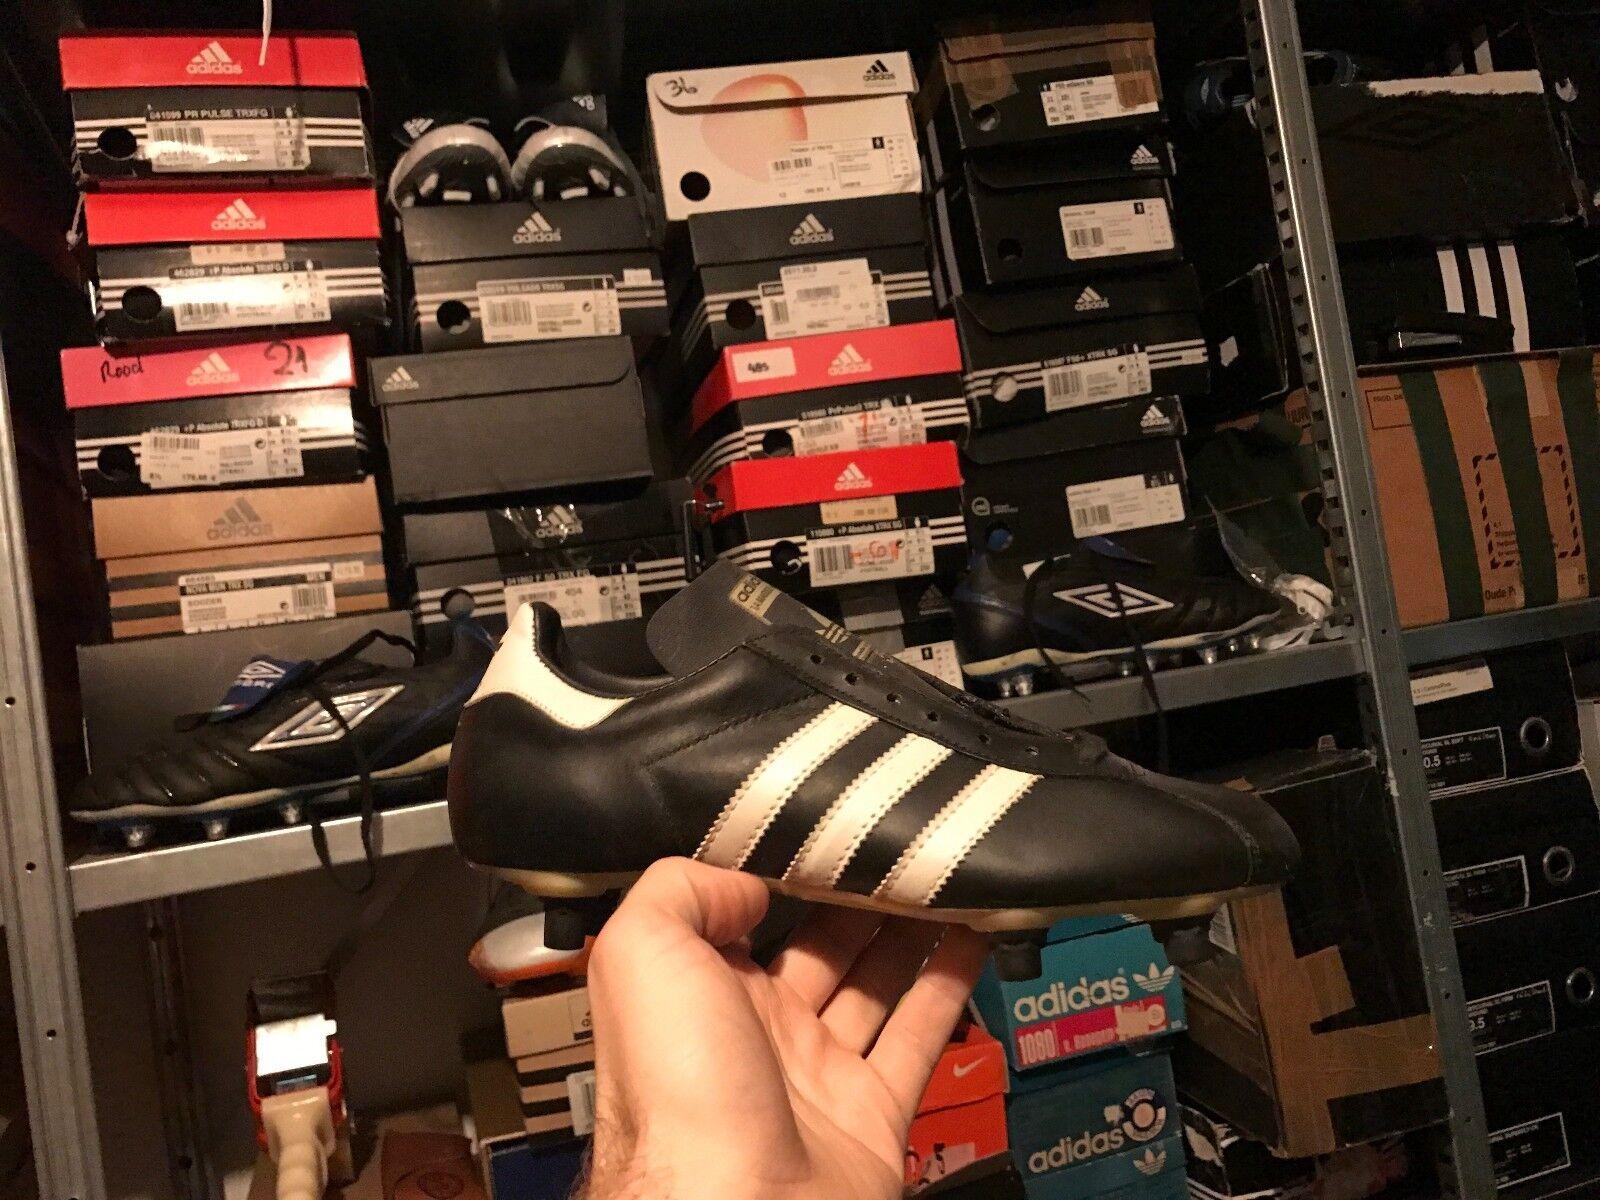 BNIB Adidas Santiago Vintage Soccer Stiefel schuhe Cleats Multiple Größes Deadstock